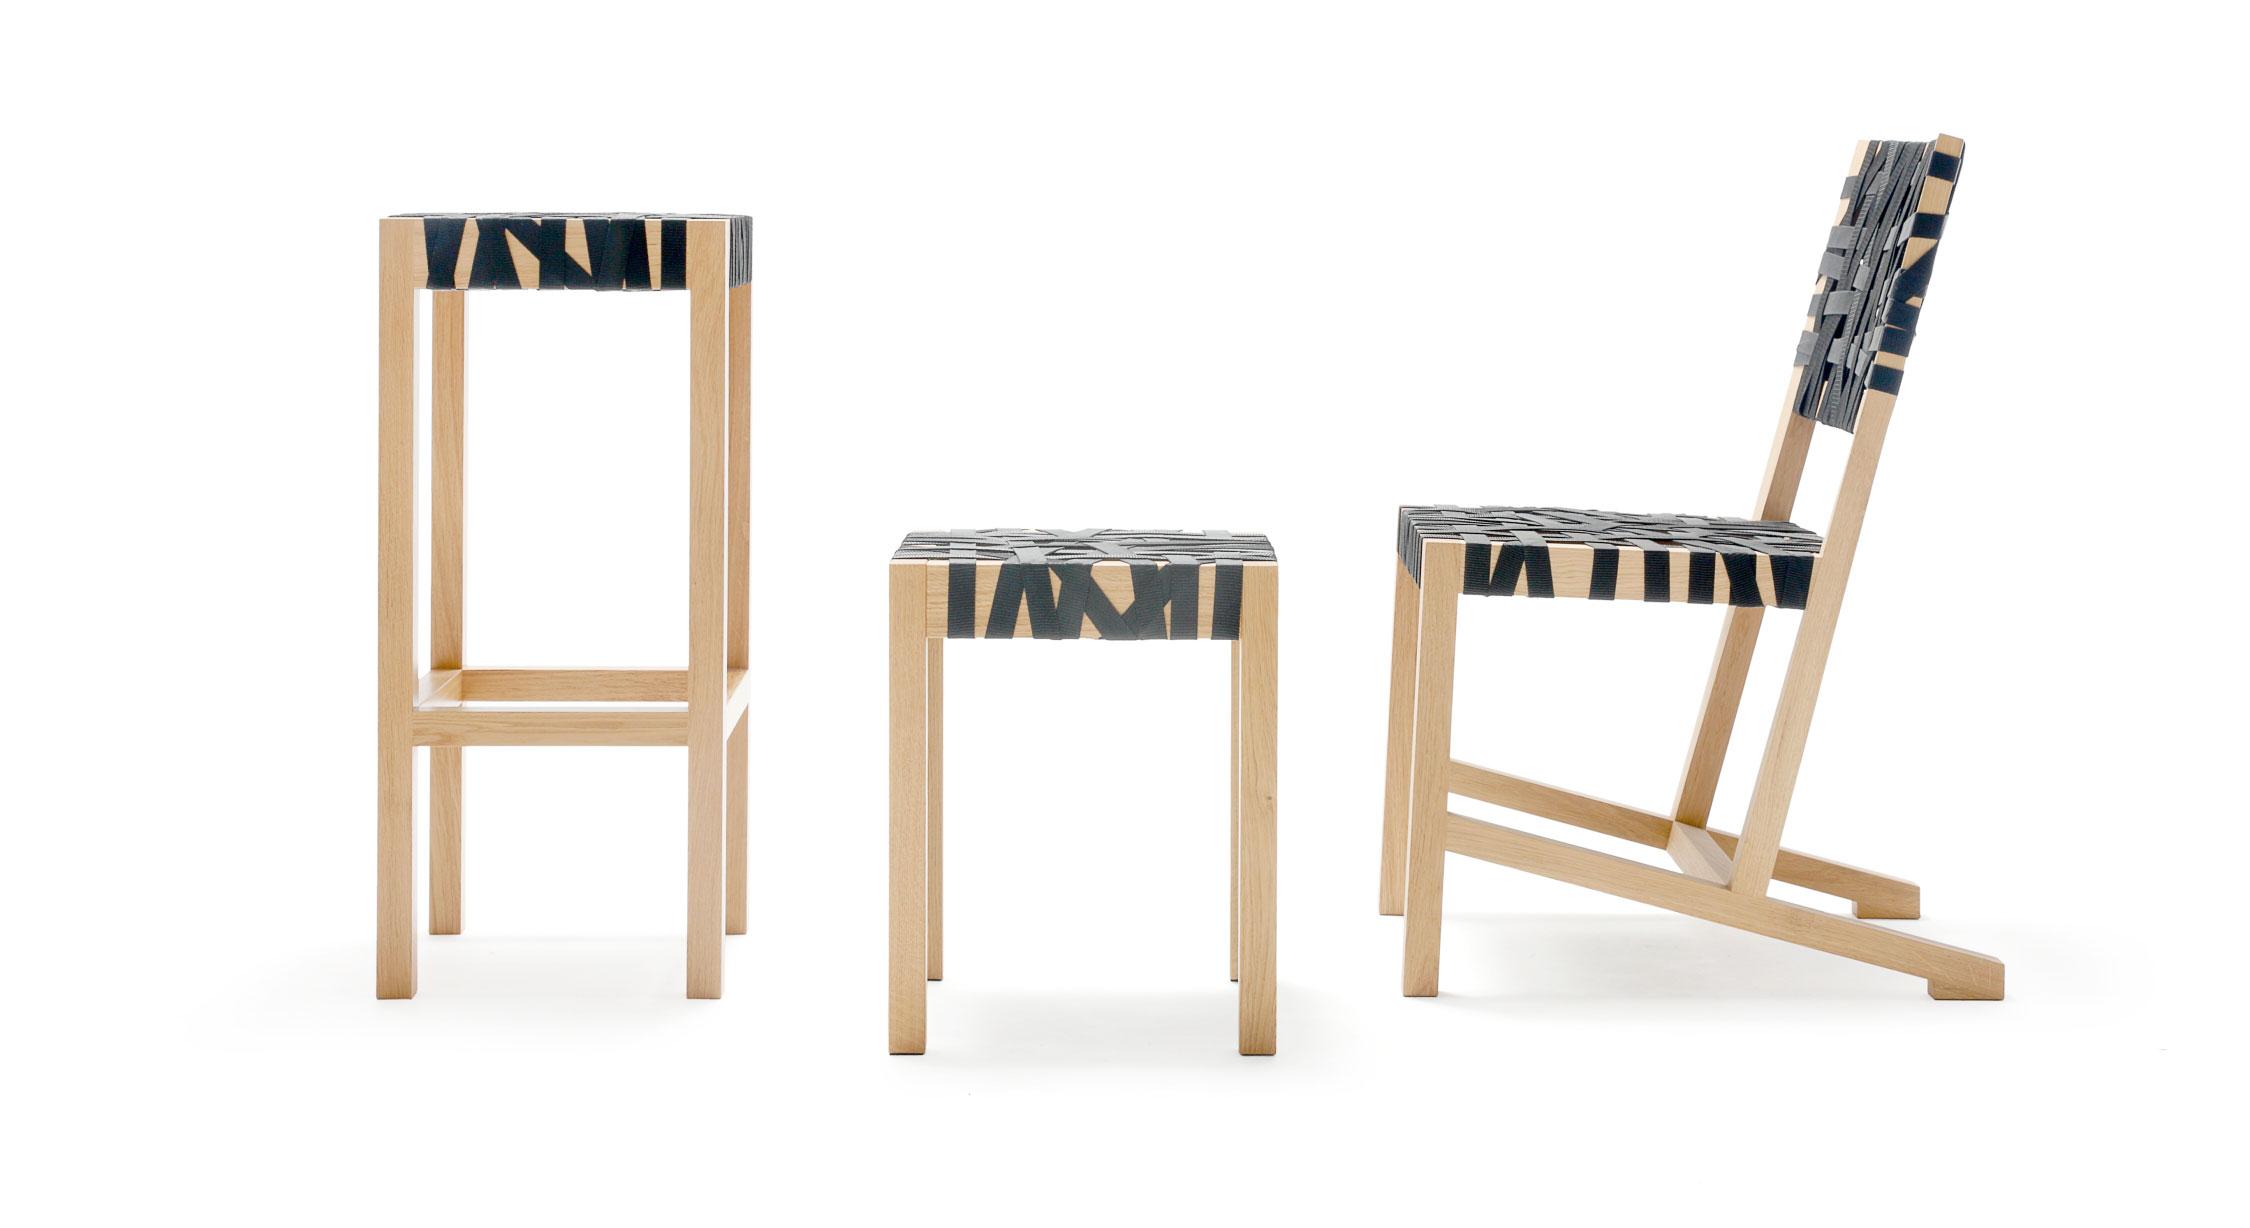 Dutch Design Stoelen Gispen.Berlage Stoel Van Gispen Kopen Bestel Online Bij Gimmii Dutch Design